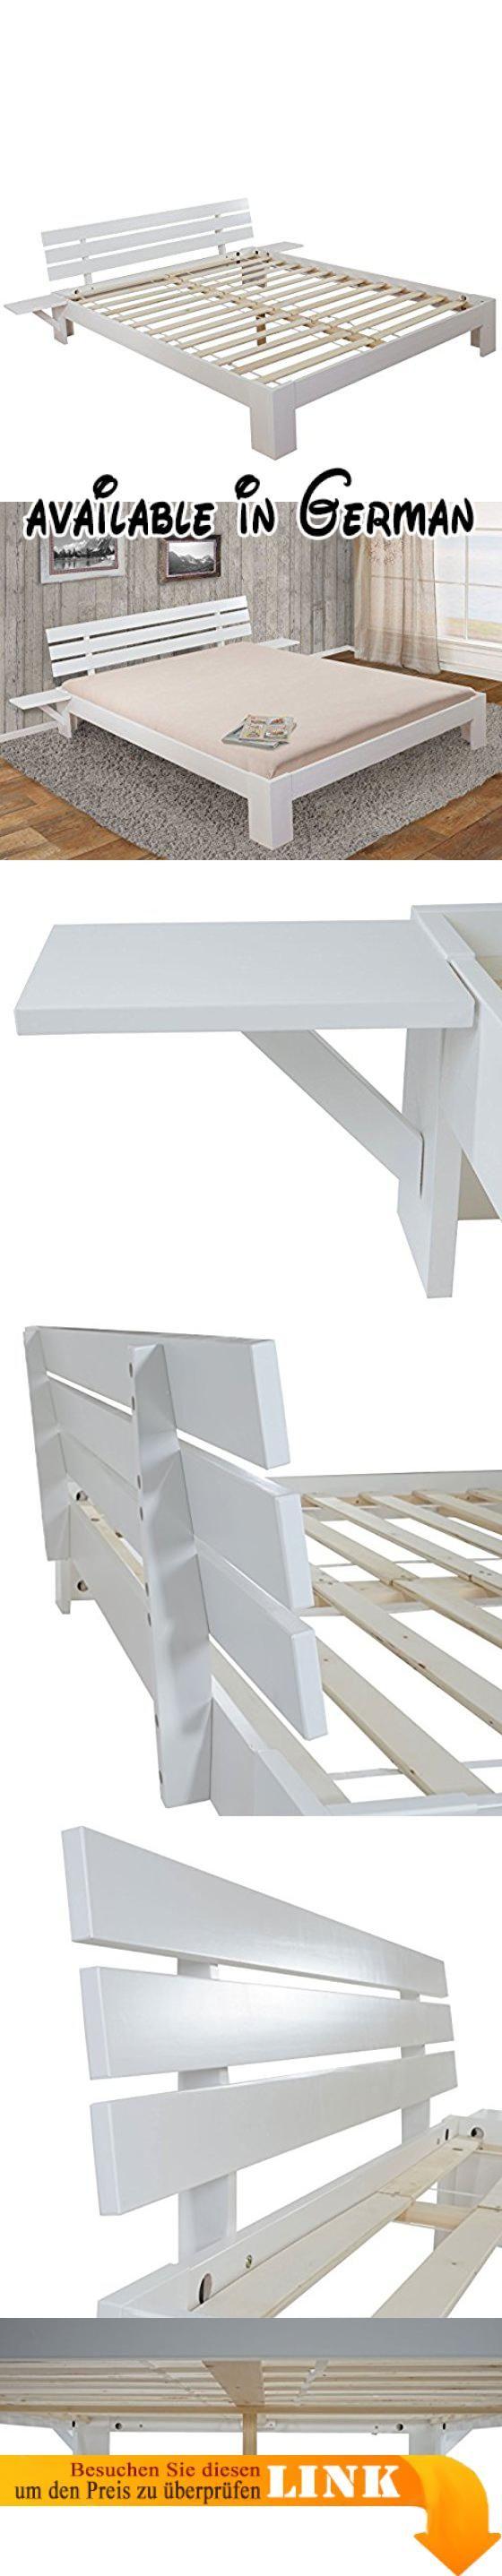 b015itlf56 bett perth doppelbett massivholz incl lattenrost ablage kiefer 160x200cm weiss lackiert geeignet fur matratzen in der grosse 160x200